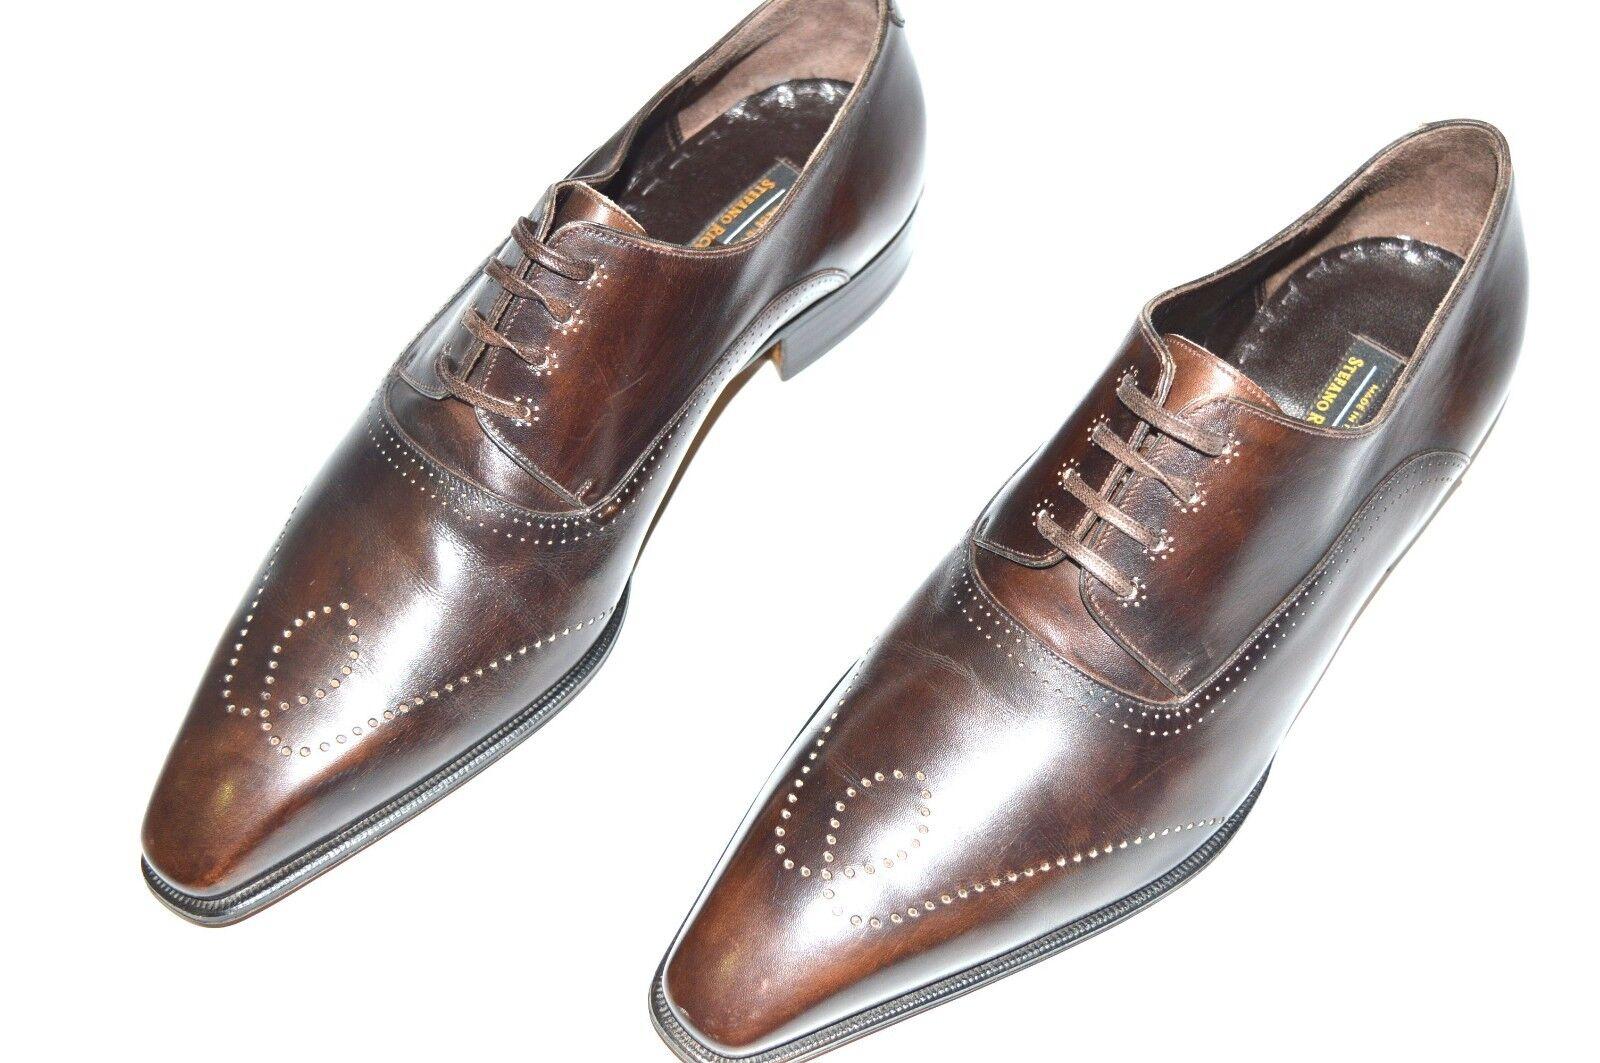 Nuevo STEFANO RICCI Zapatos Talla nos 9 (COD S217A)